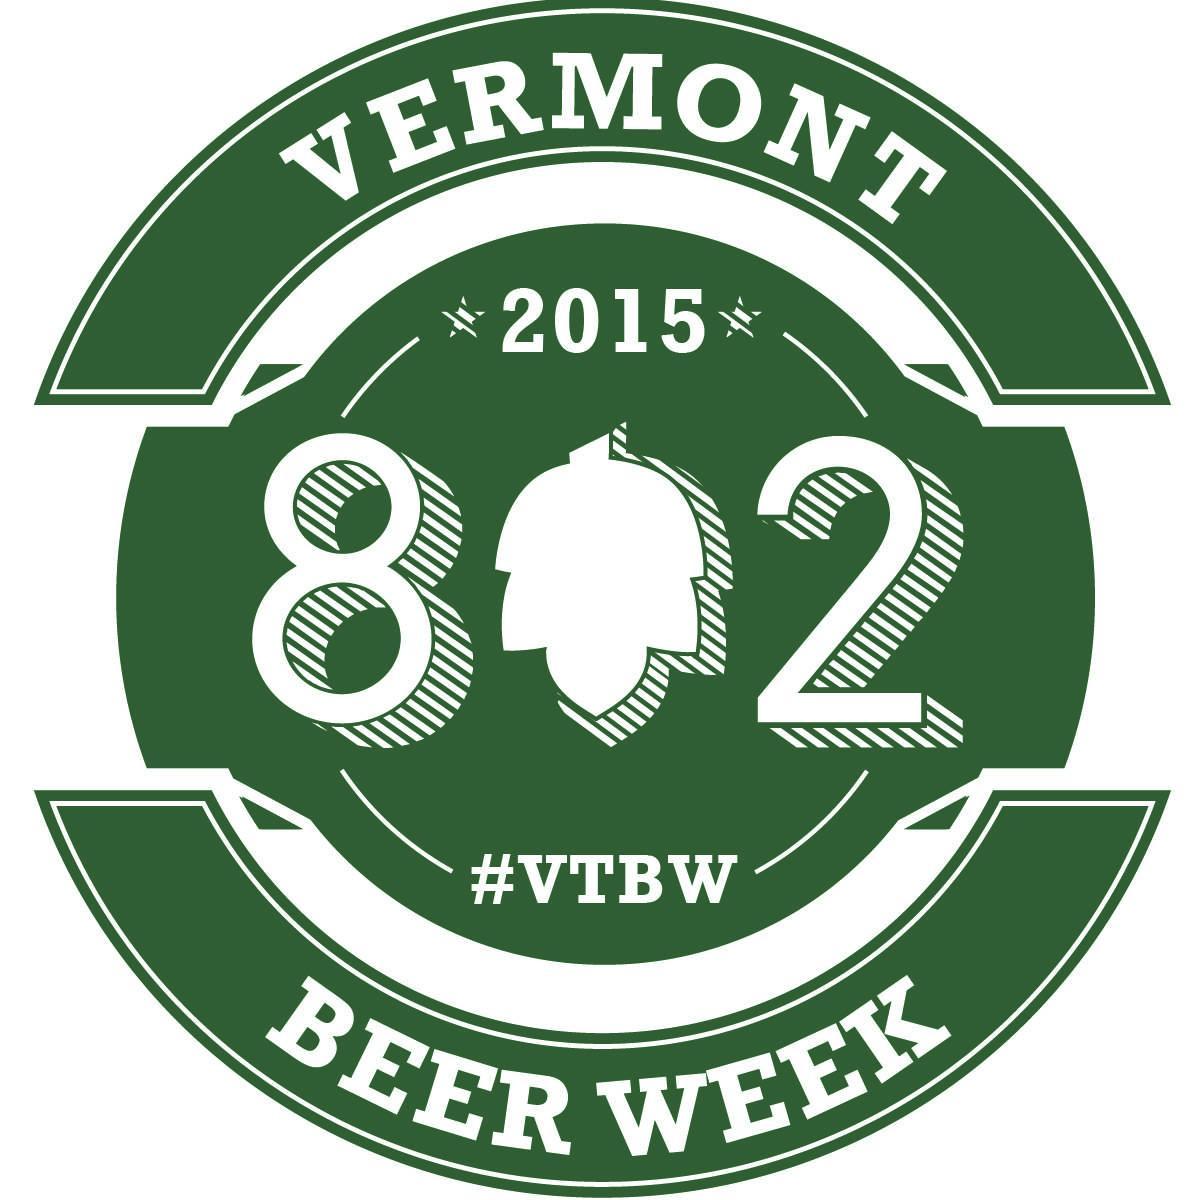 It's @VermontBeerWeek --go! http://t.co/IZkDBMSOwM #VTBW http://t.co/RCs460yro9